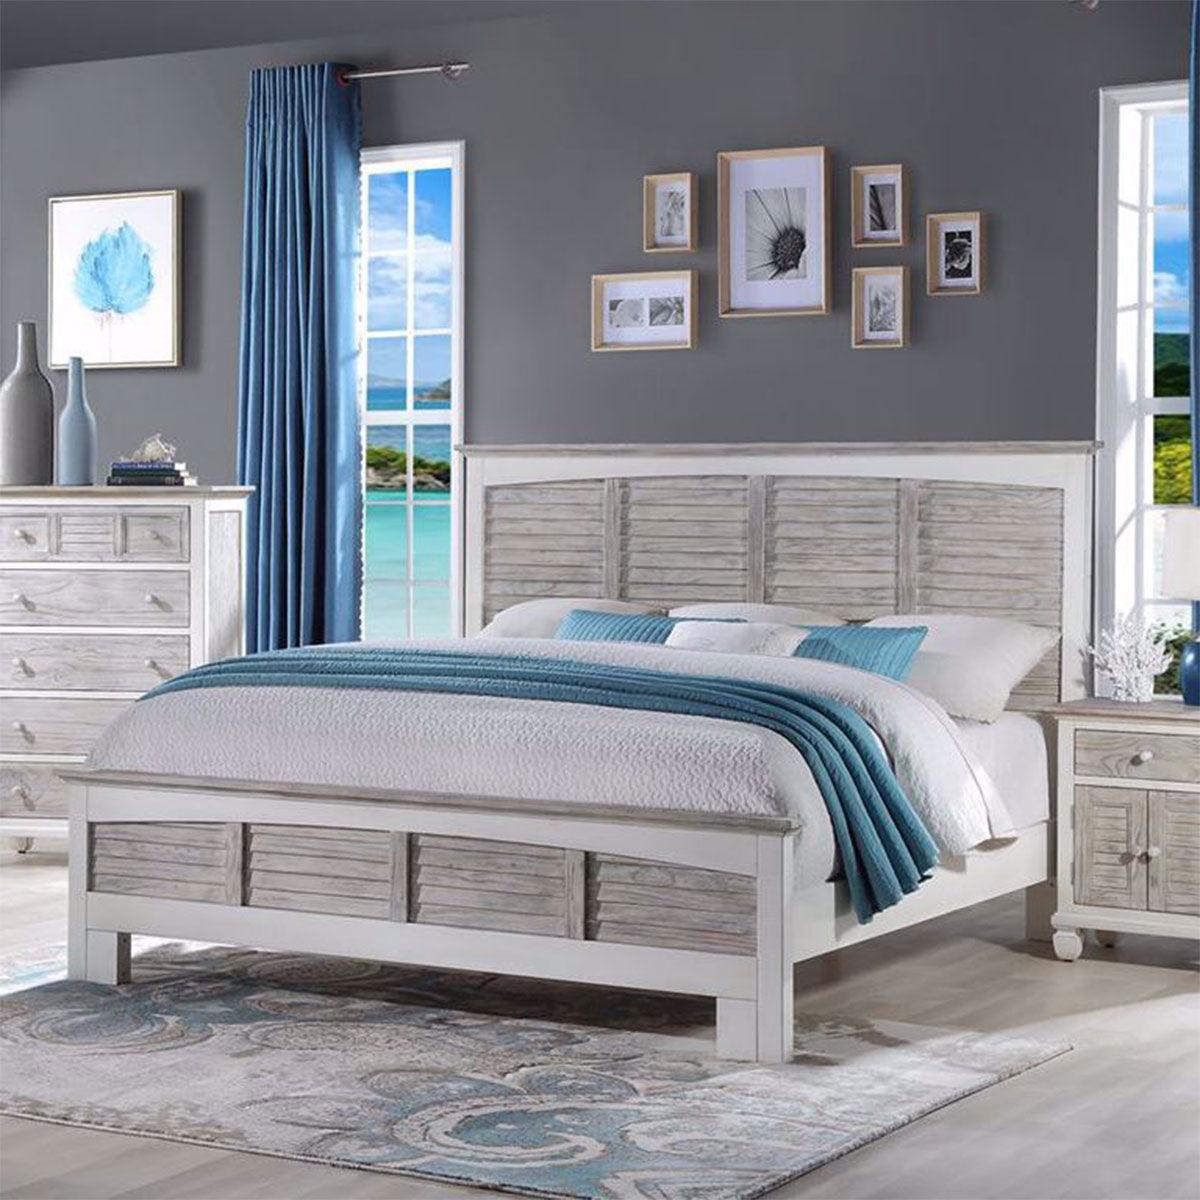 Picture of ISLAMORADA PANEL BED